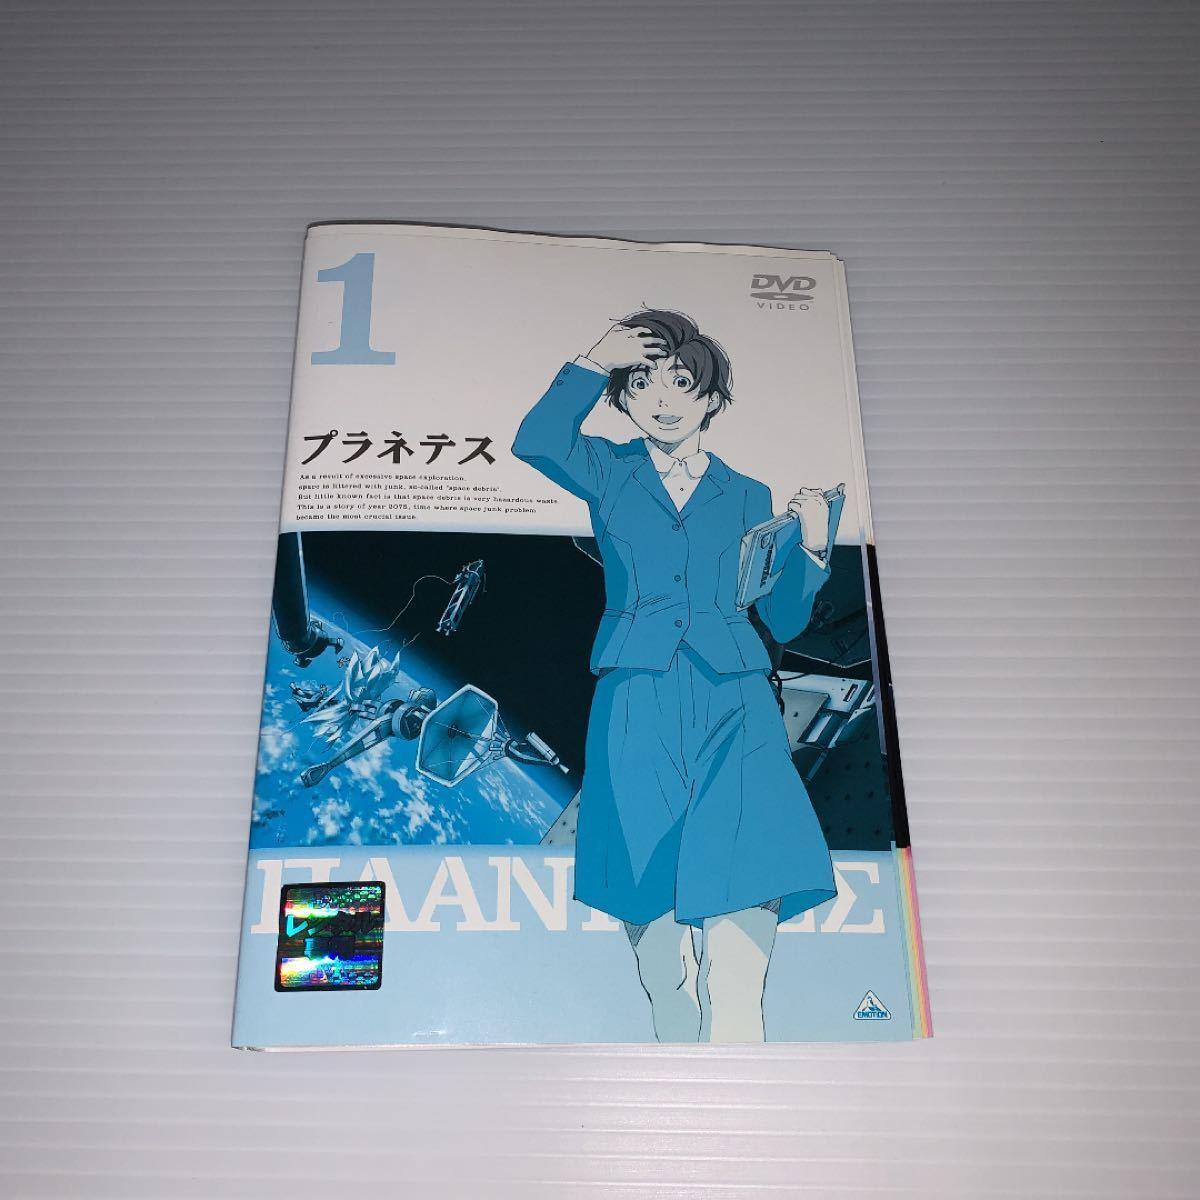 DVDアニメ プラネテス 全9巻セット